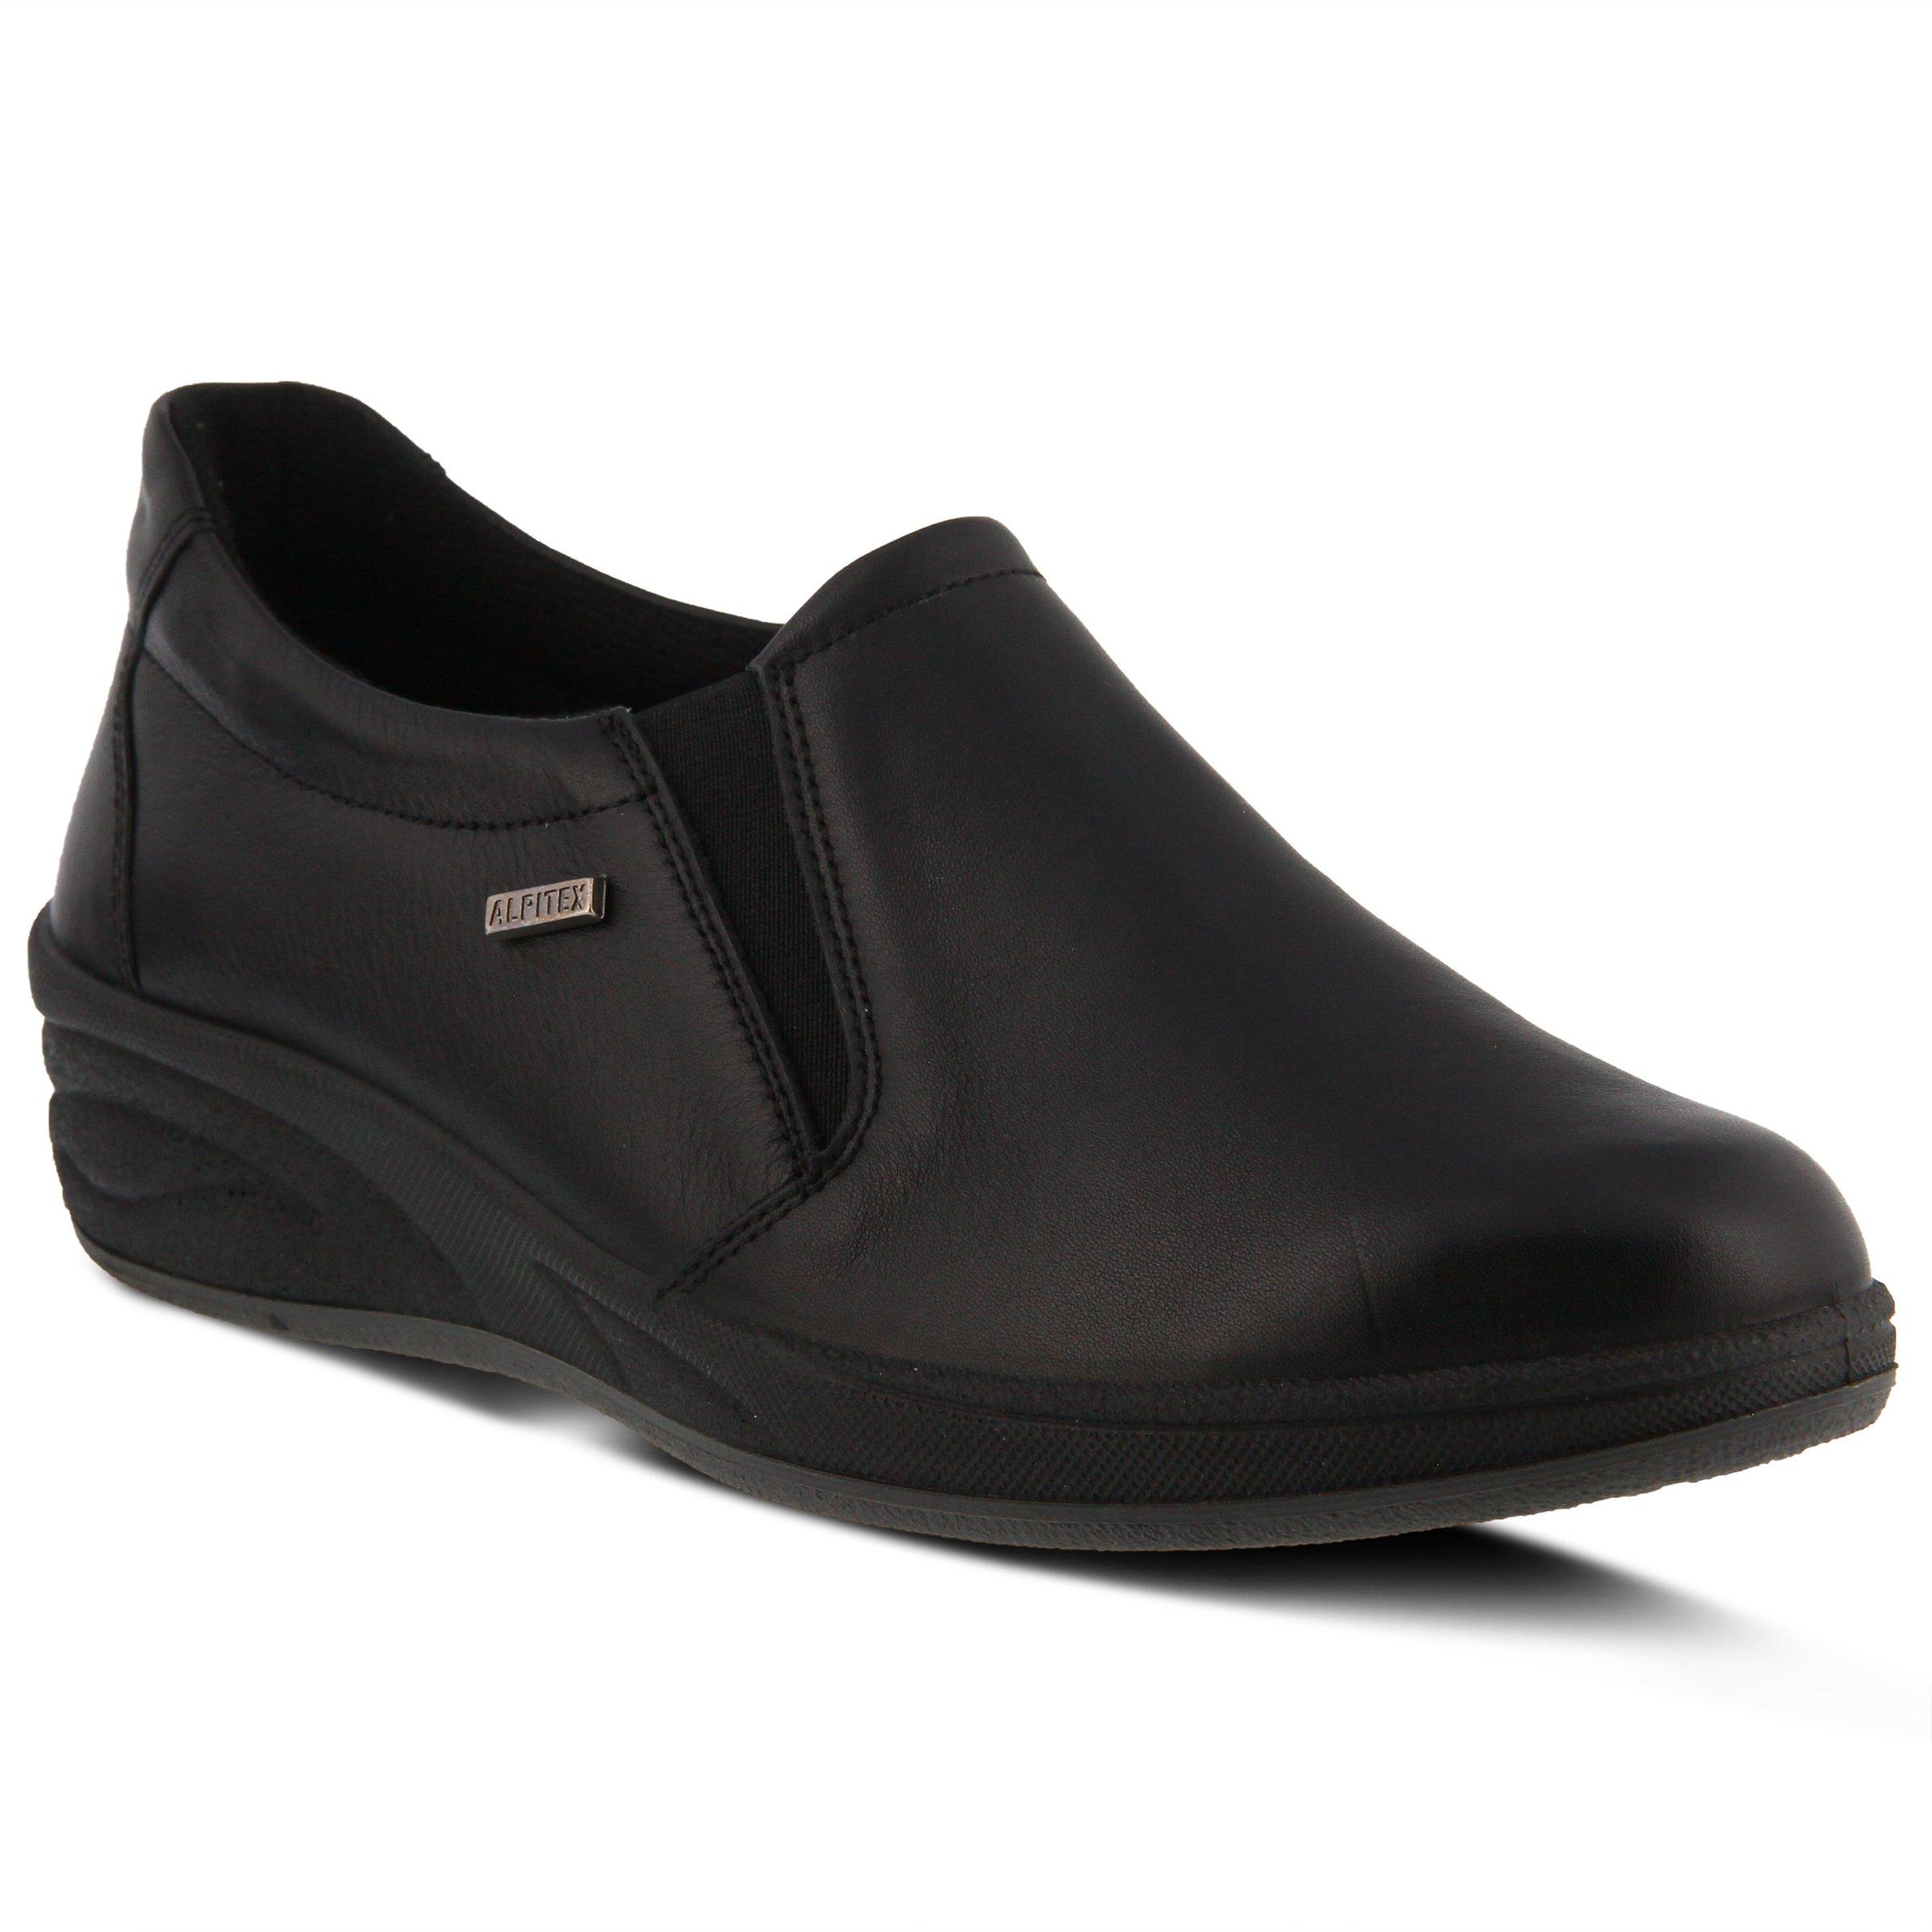 Details about  /Flexus by Spring Step Women/'s Amaya Loafer Choose SZ//color